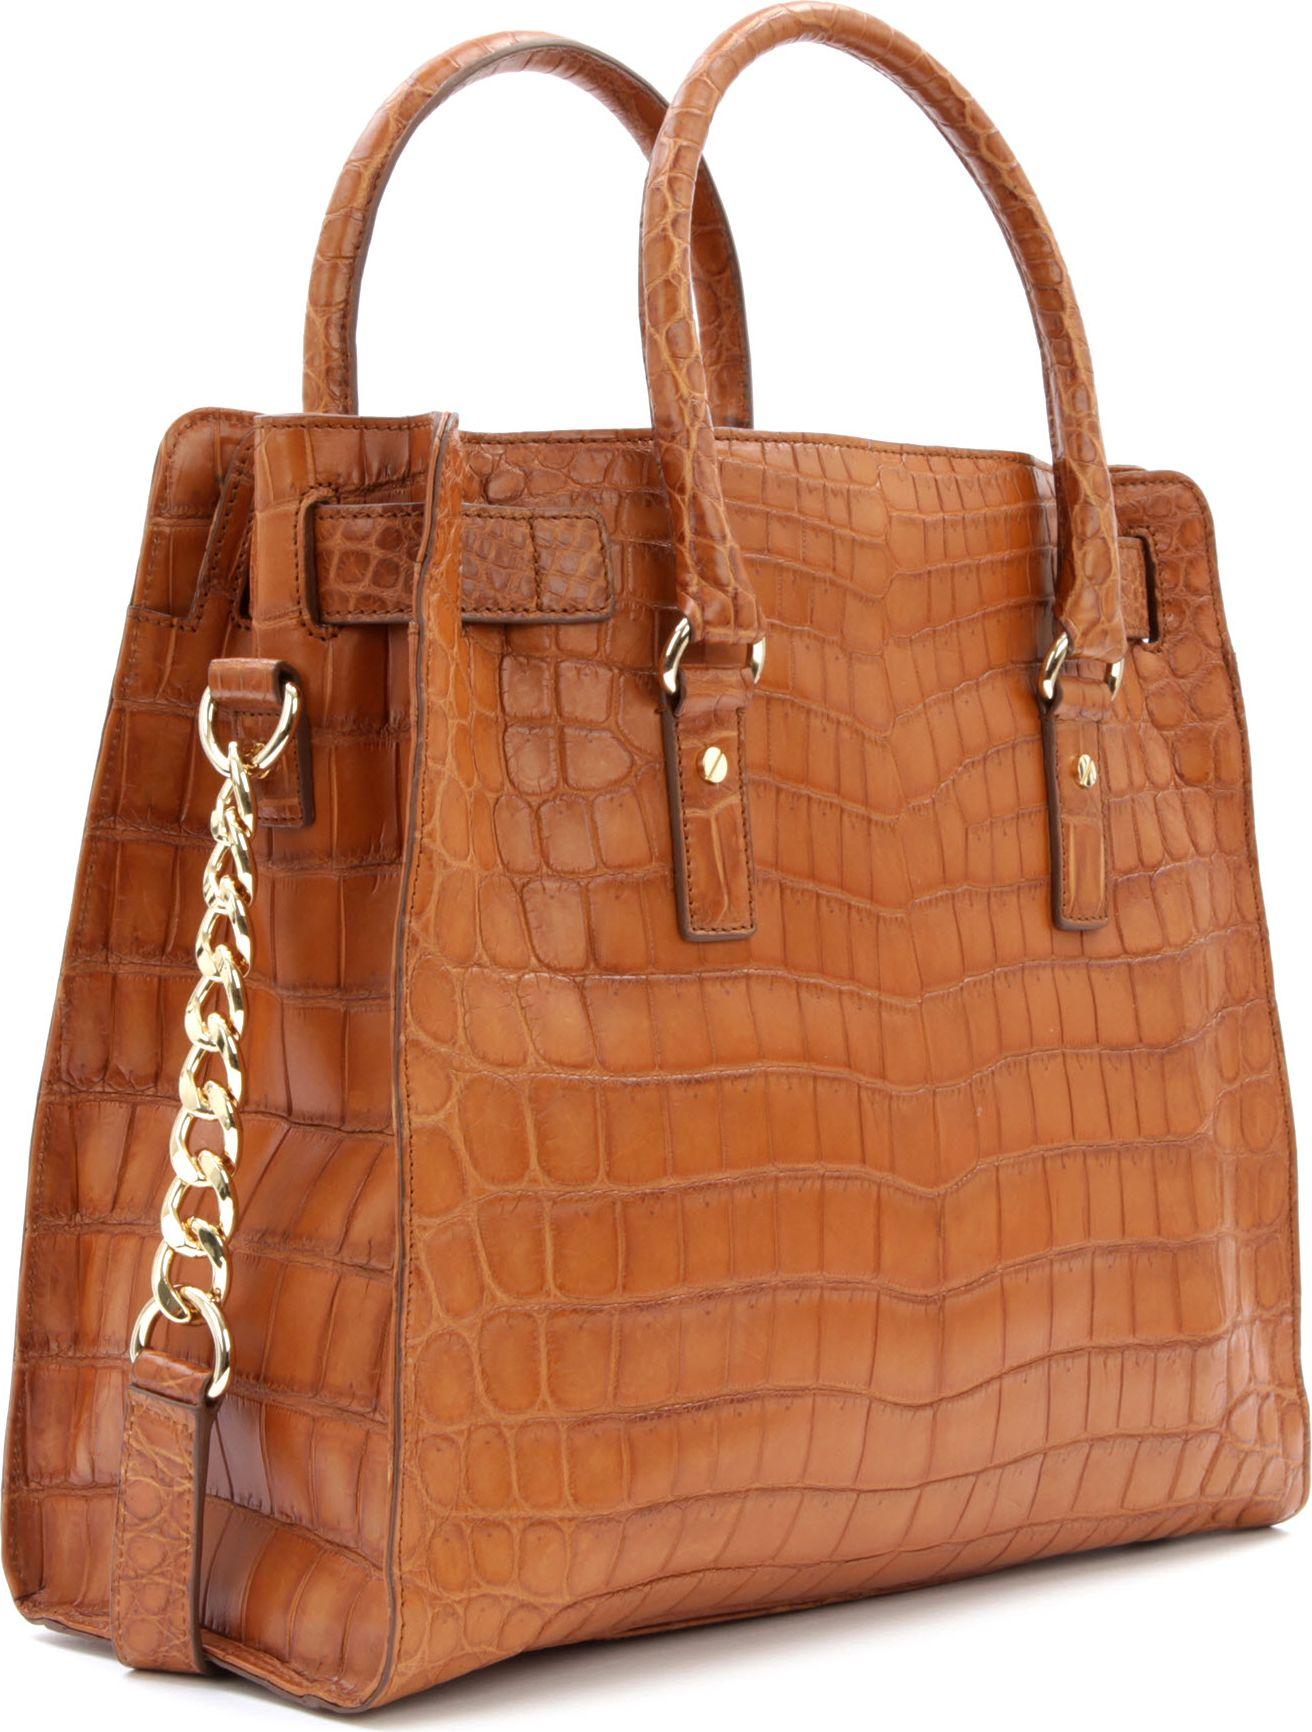 9106b904c851 Michael Kors Hamilton Croc Leather Tote in Brown - Lyst